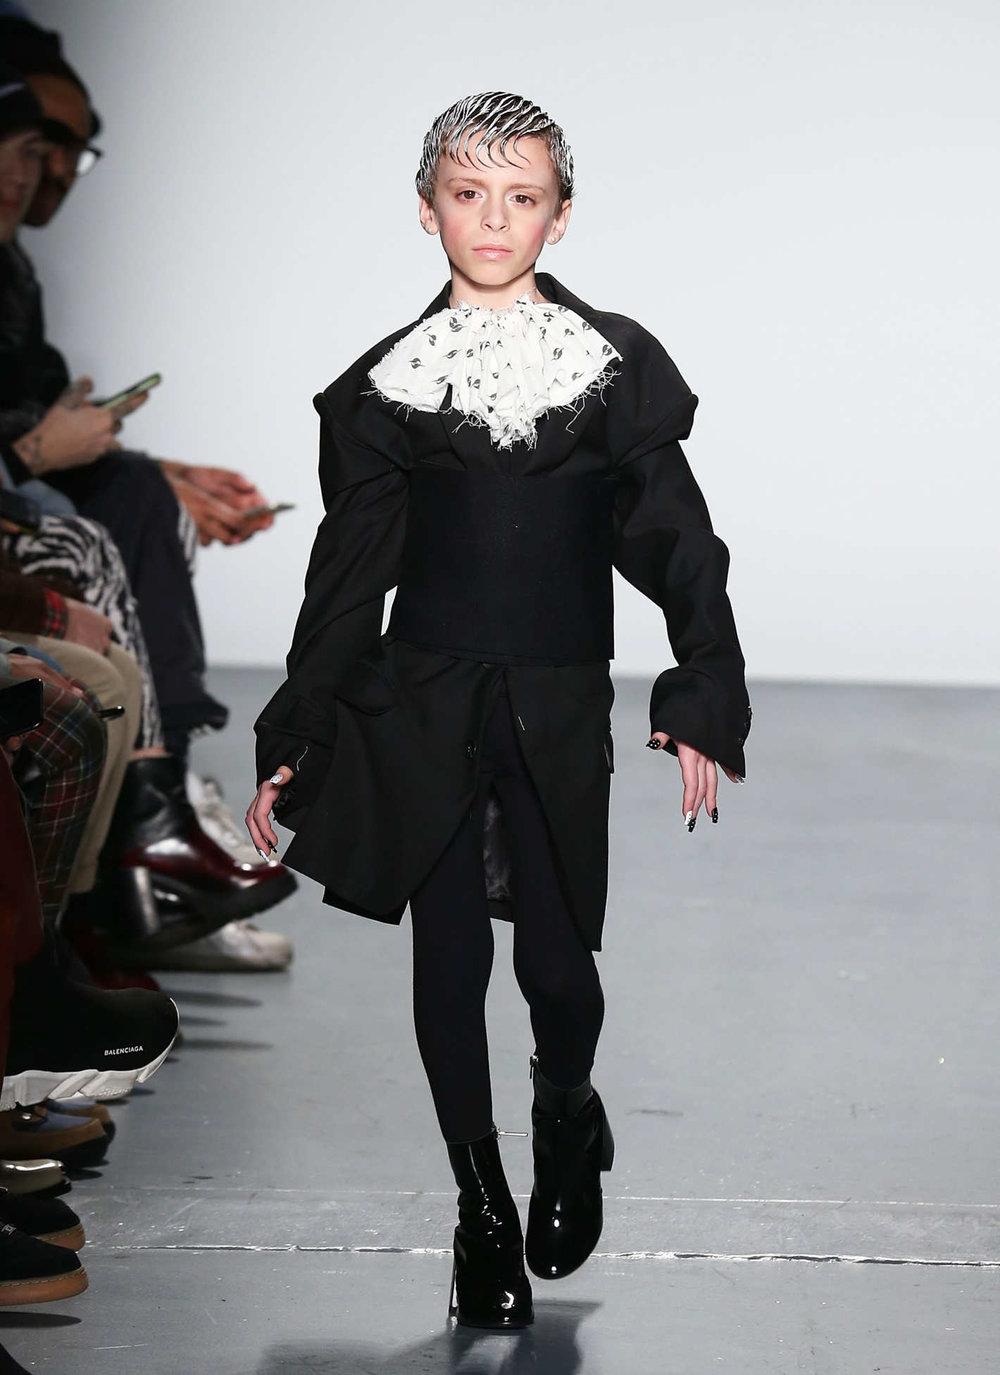 SOURCE:  https://www.thecut.com/2018/02/desmond-is-amazing-fashion-week-gypsy-sport.html